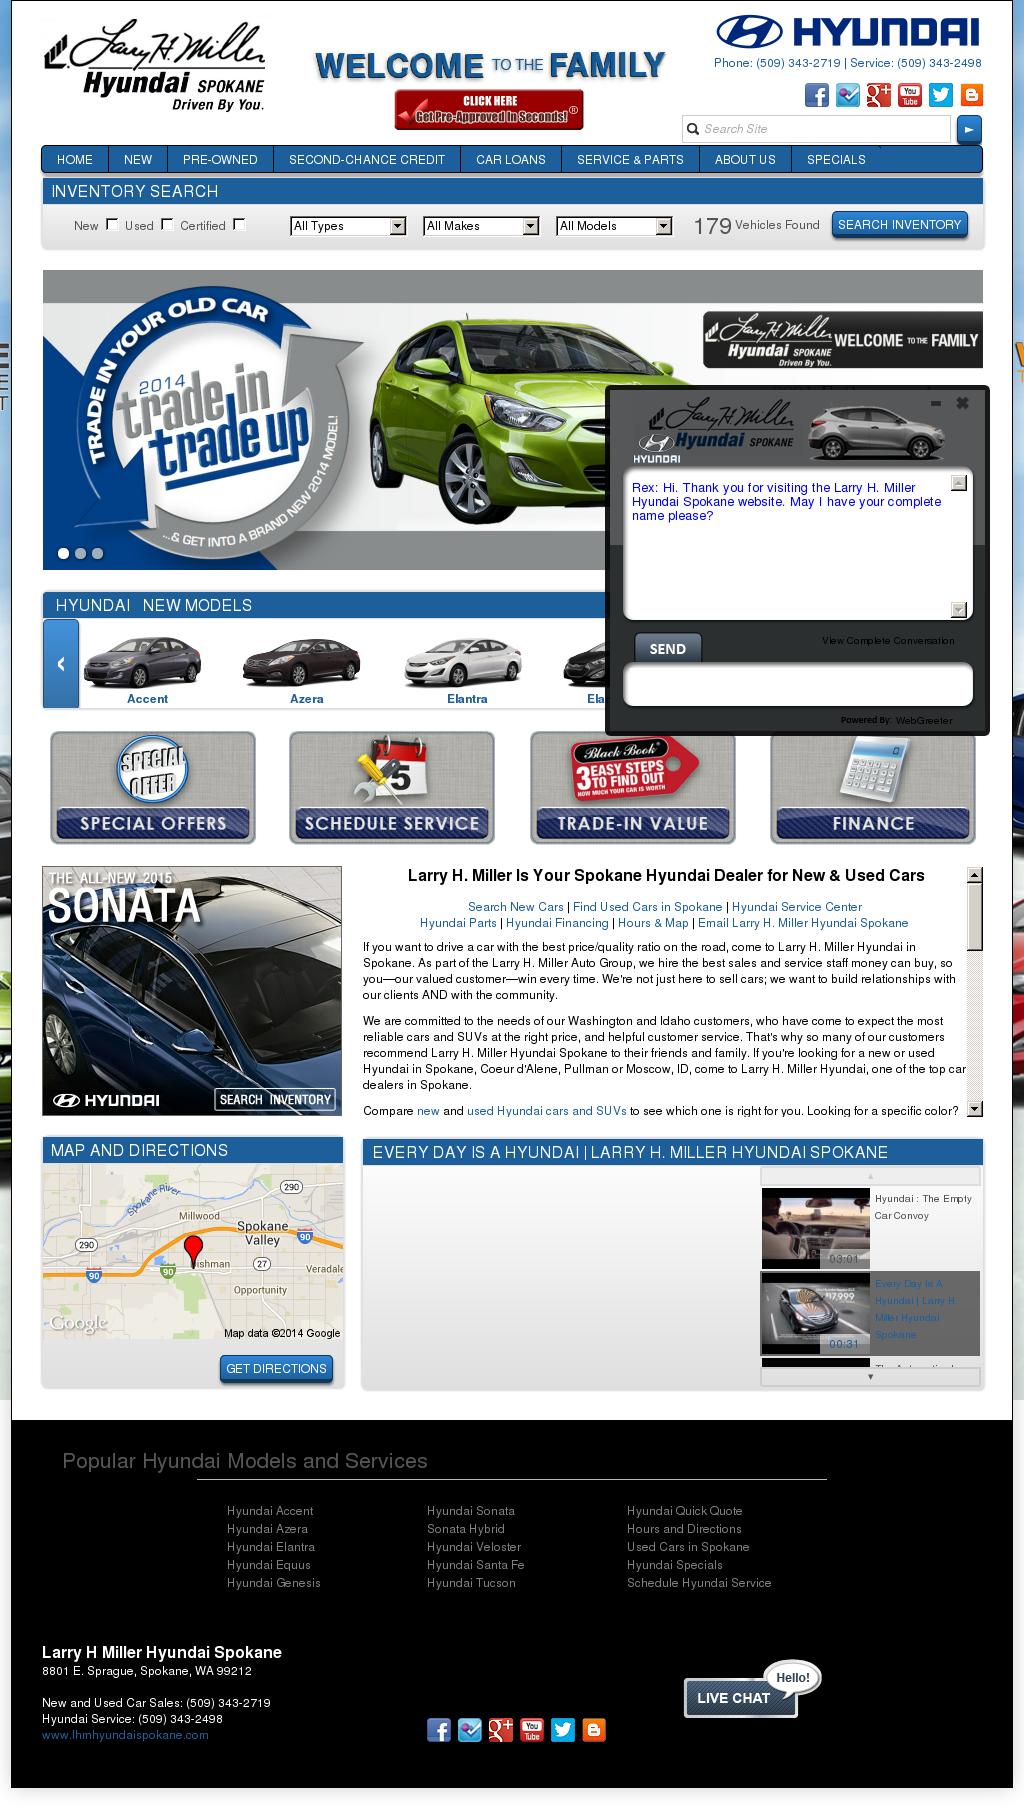 Larry H Miller Hyundai U003eu003e Larry H. Miller Hyundai Spokane Company Profile |  Owler